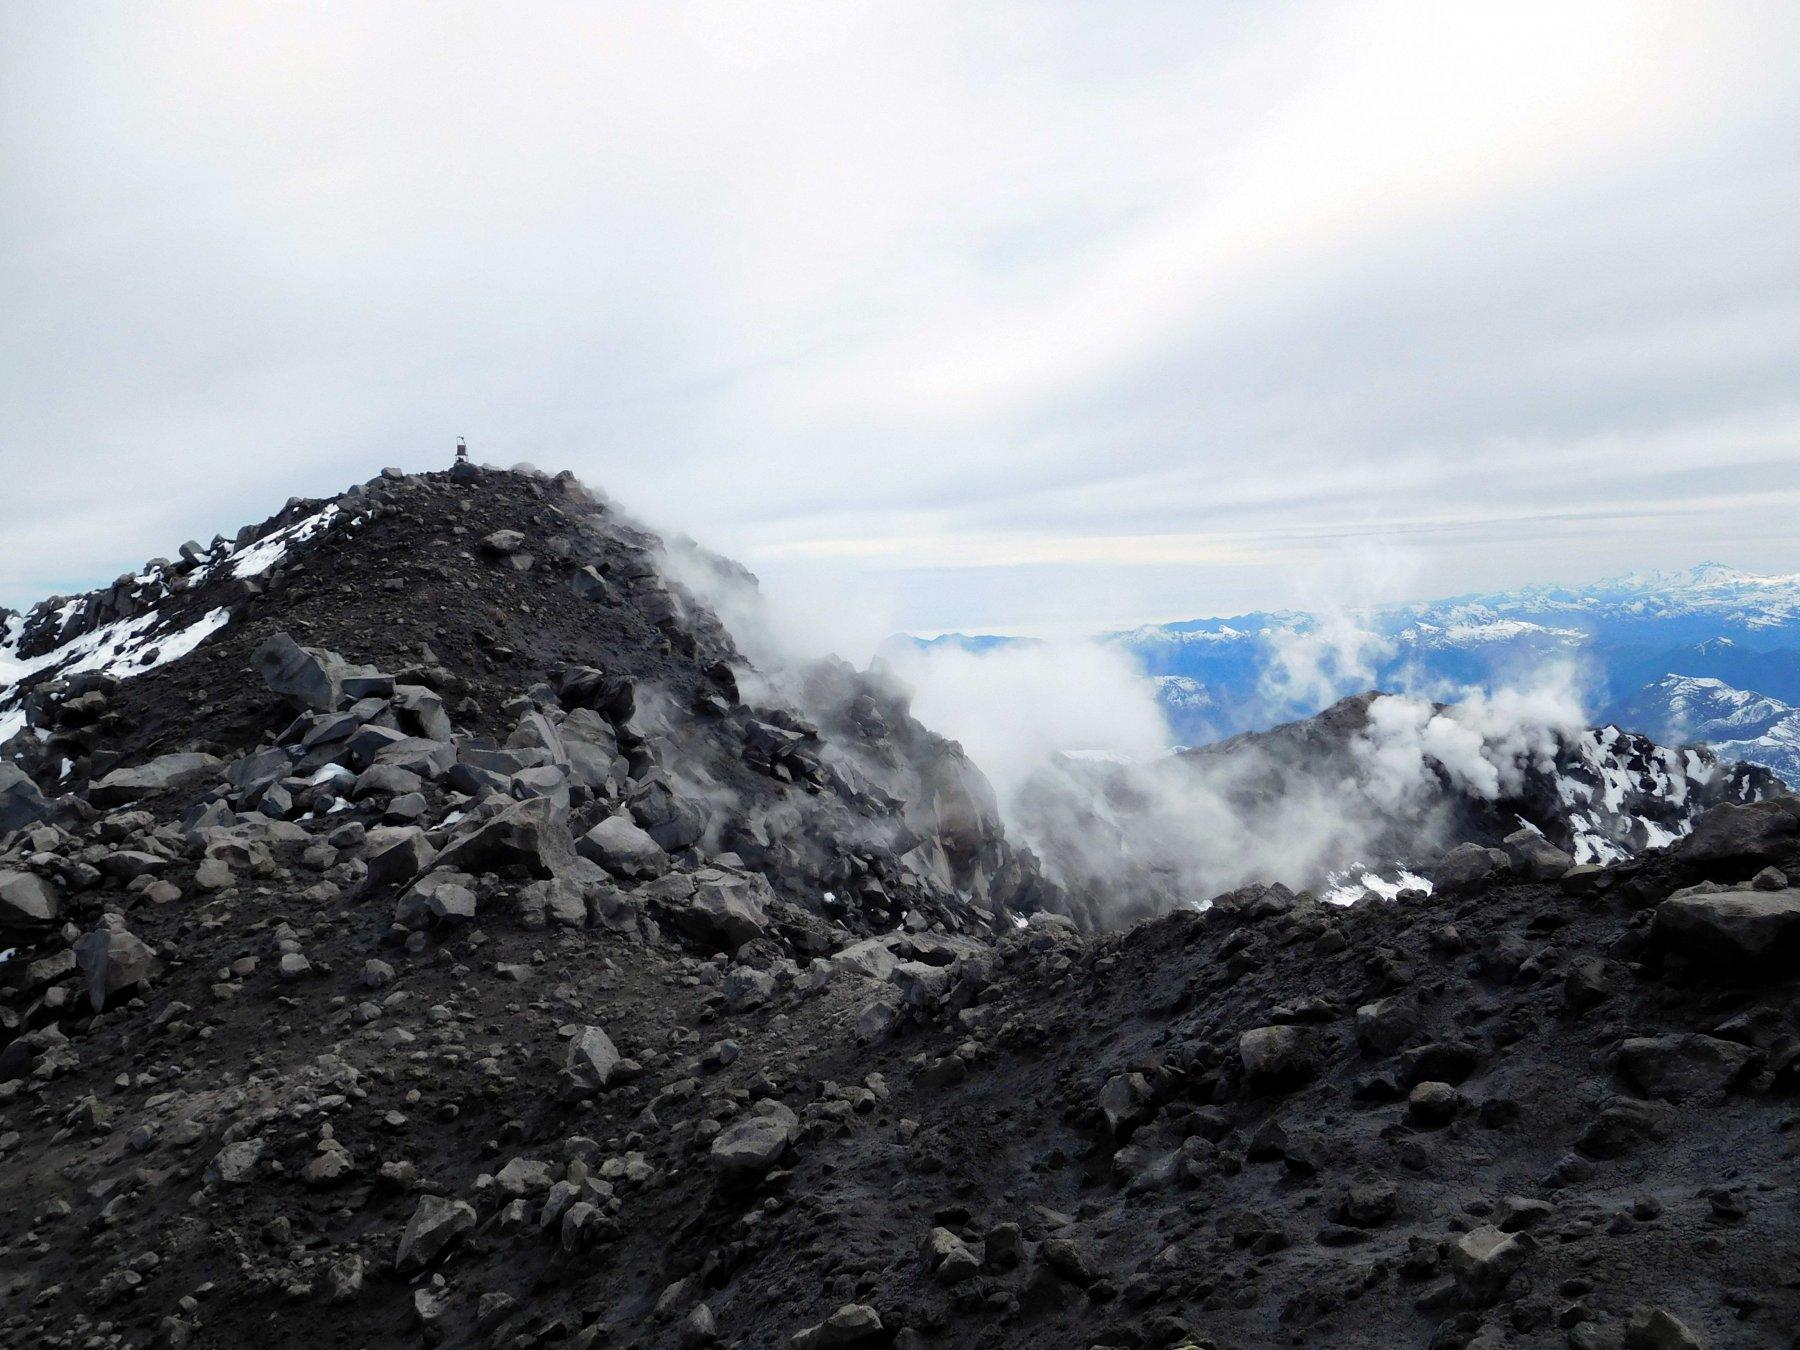 Chillan Viejo y Nuevo (Volcanes) Via normale del Terme di Chillan 2016-10-01